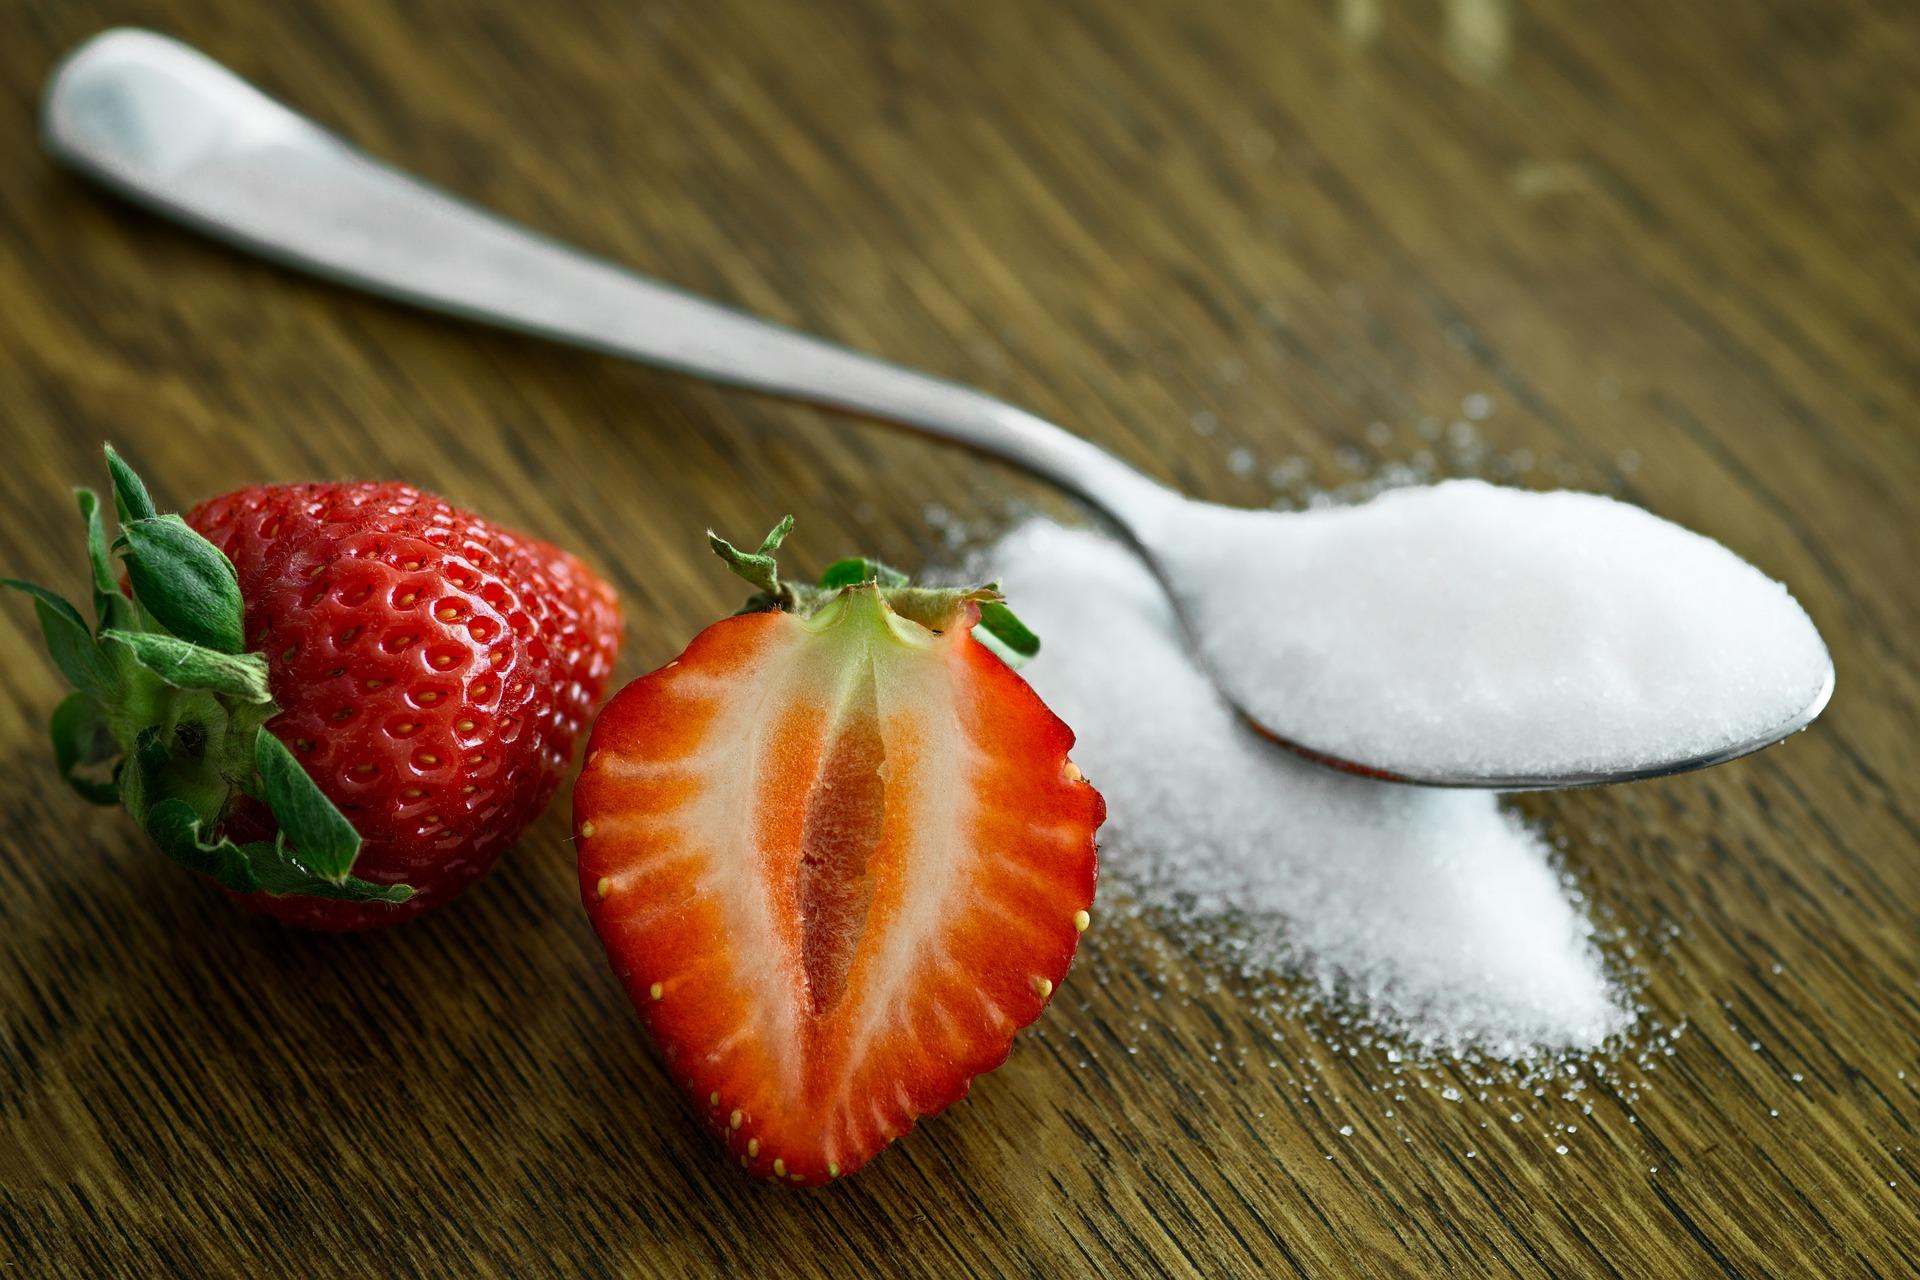 Alkohole cukrowe (poliole): eksperci odpowiadają na pytania